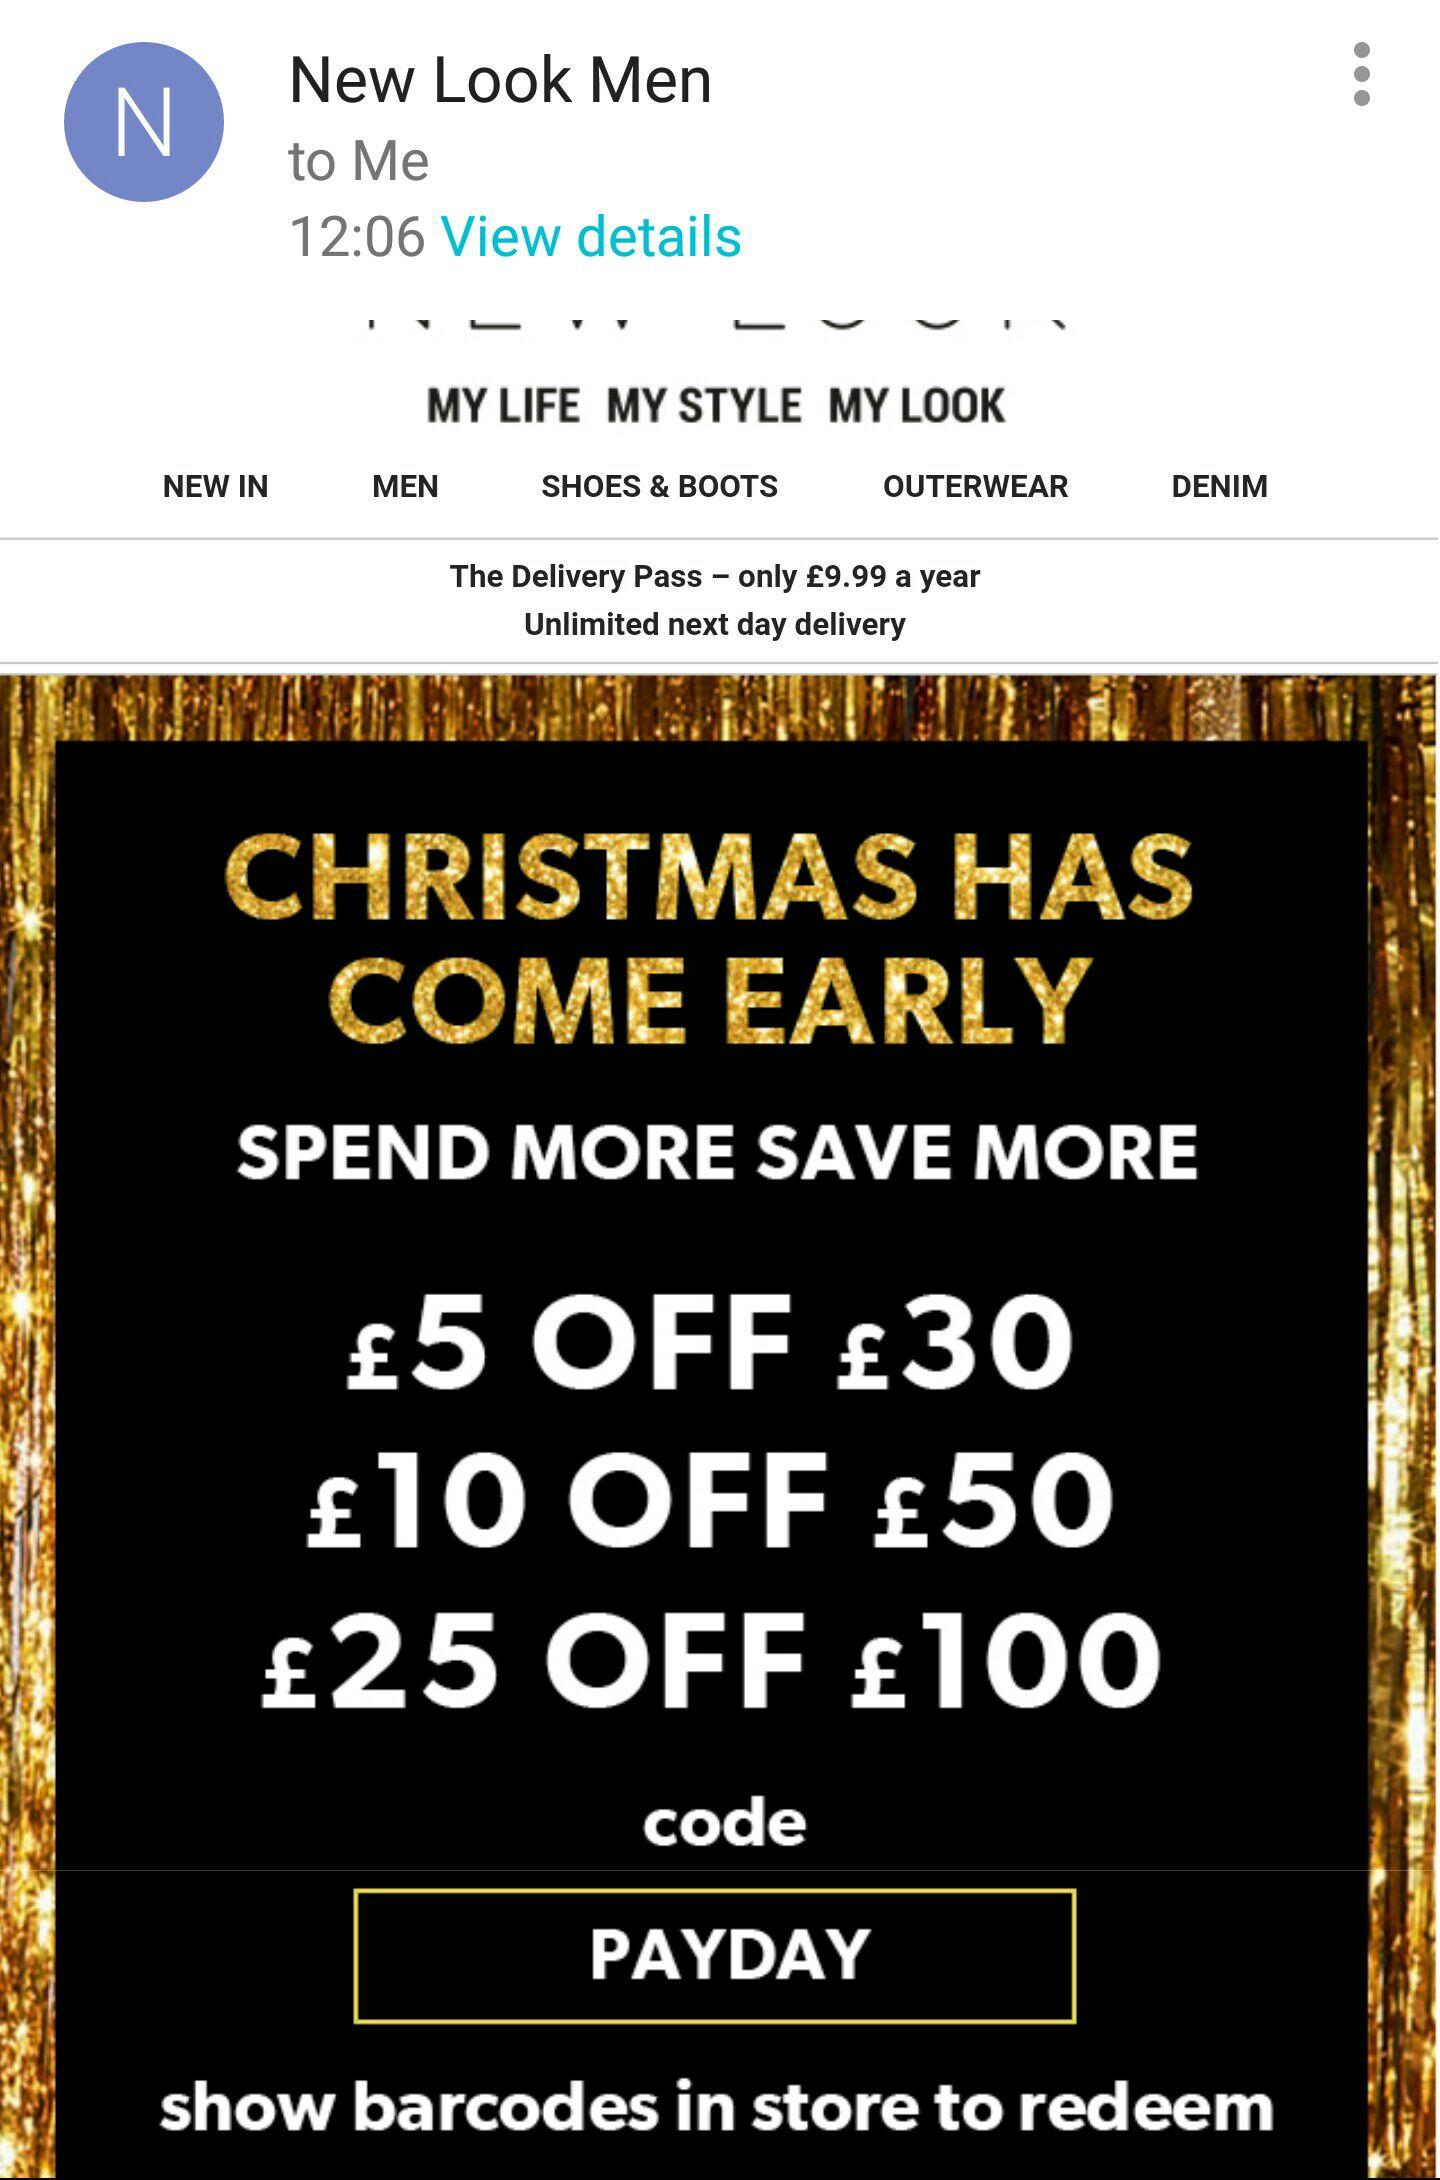 New Look Man Voucher - £5 off £30 -  £10 off £50 - £25 off £100